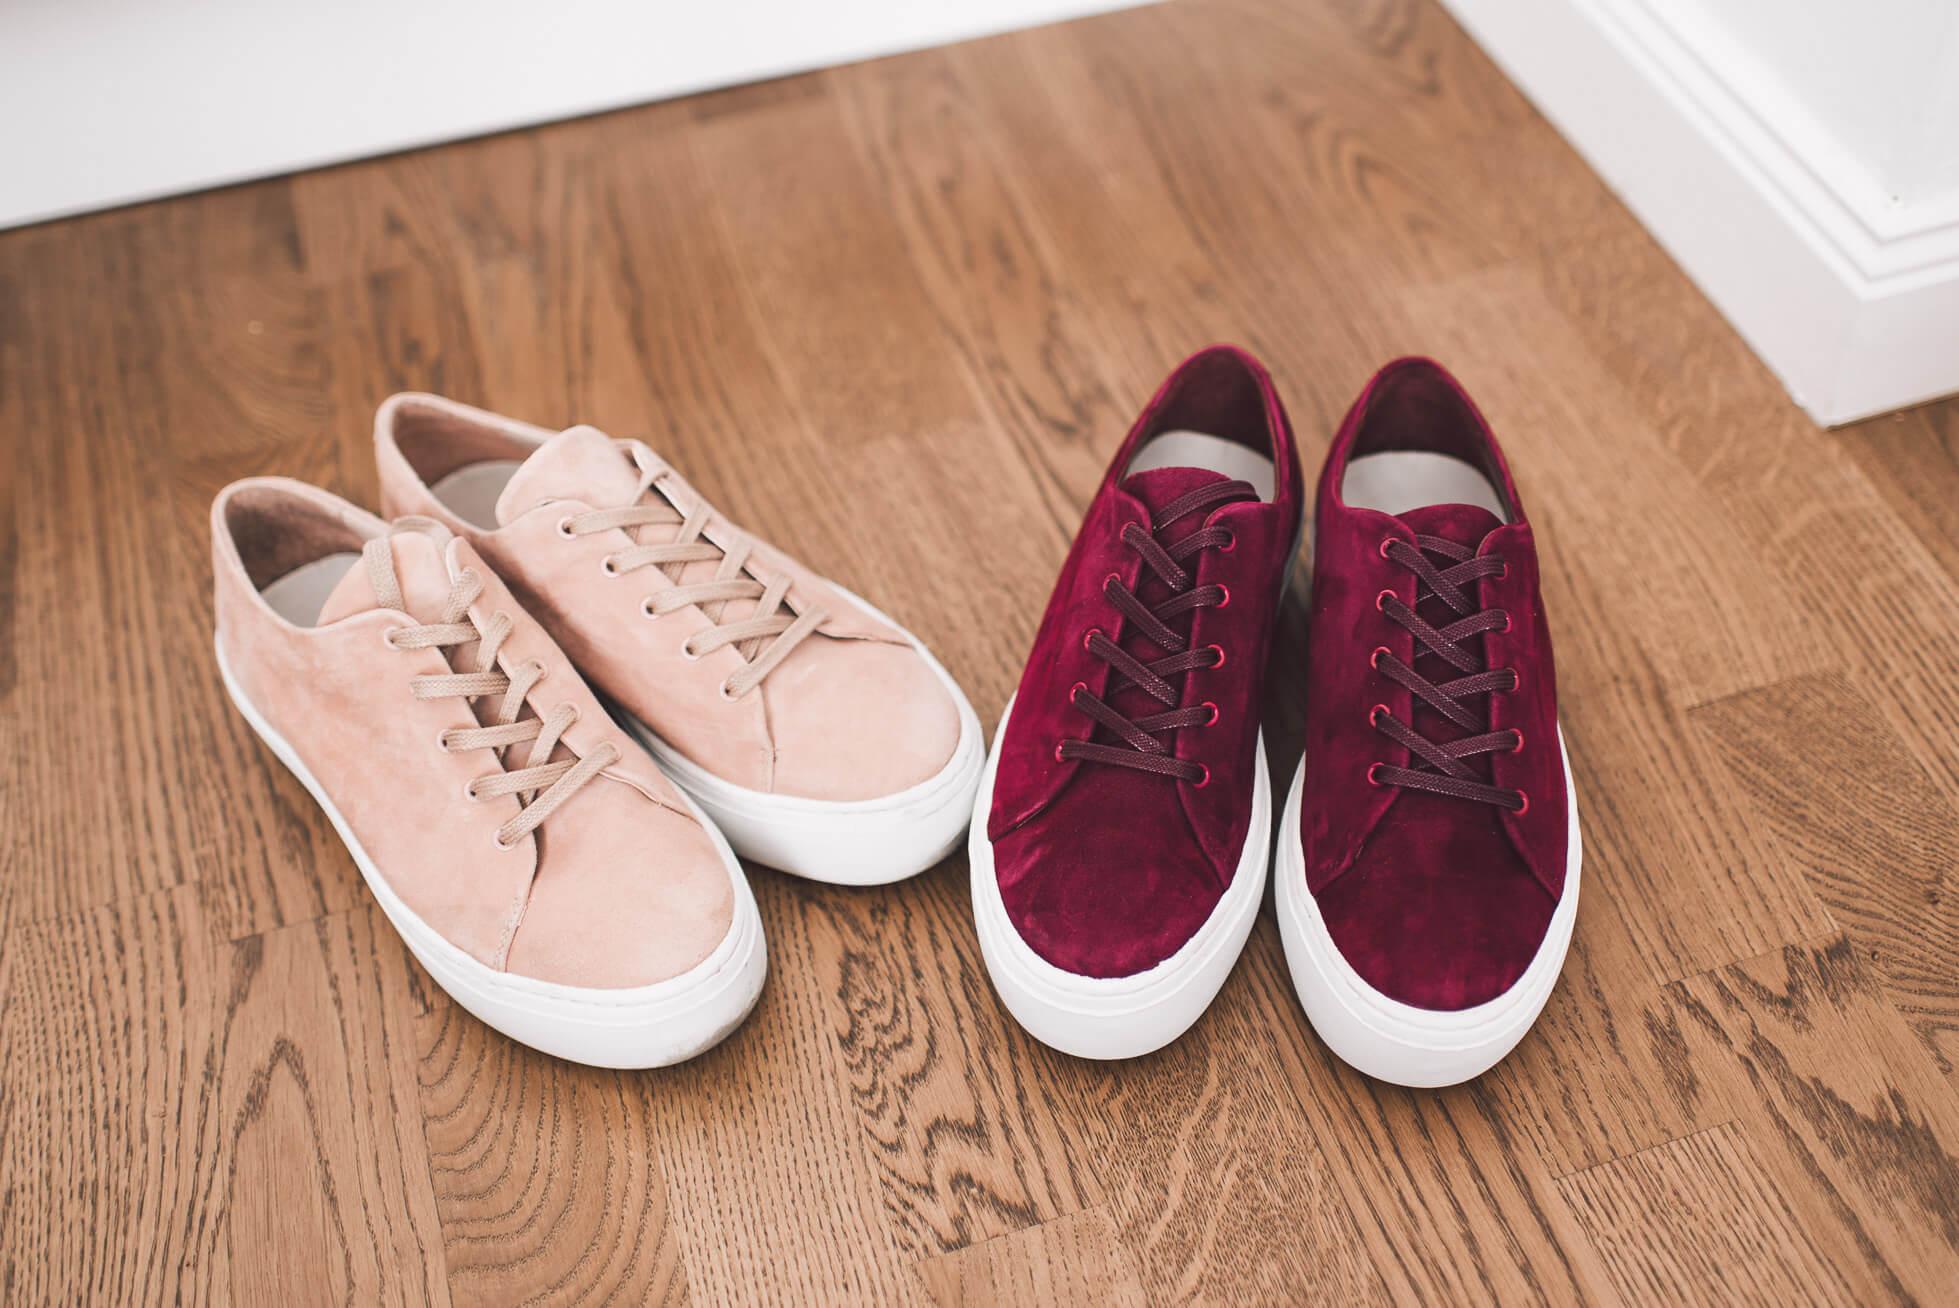 janni-deler-sneaker-loveDSC_7098